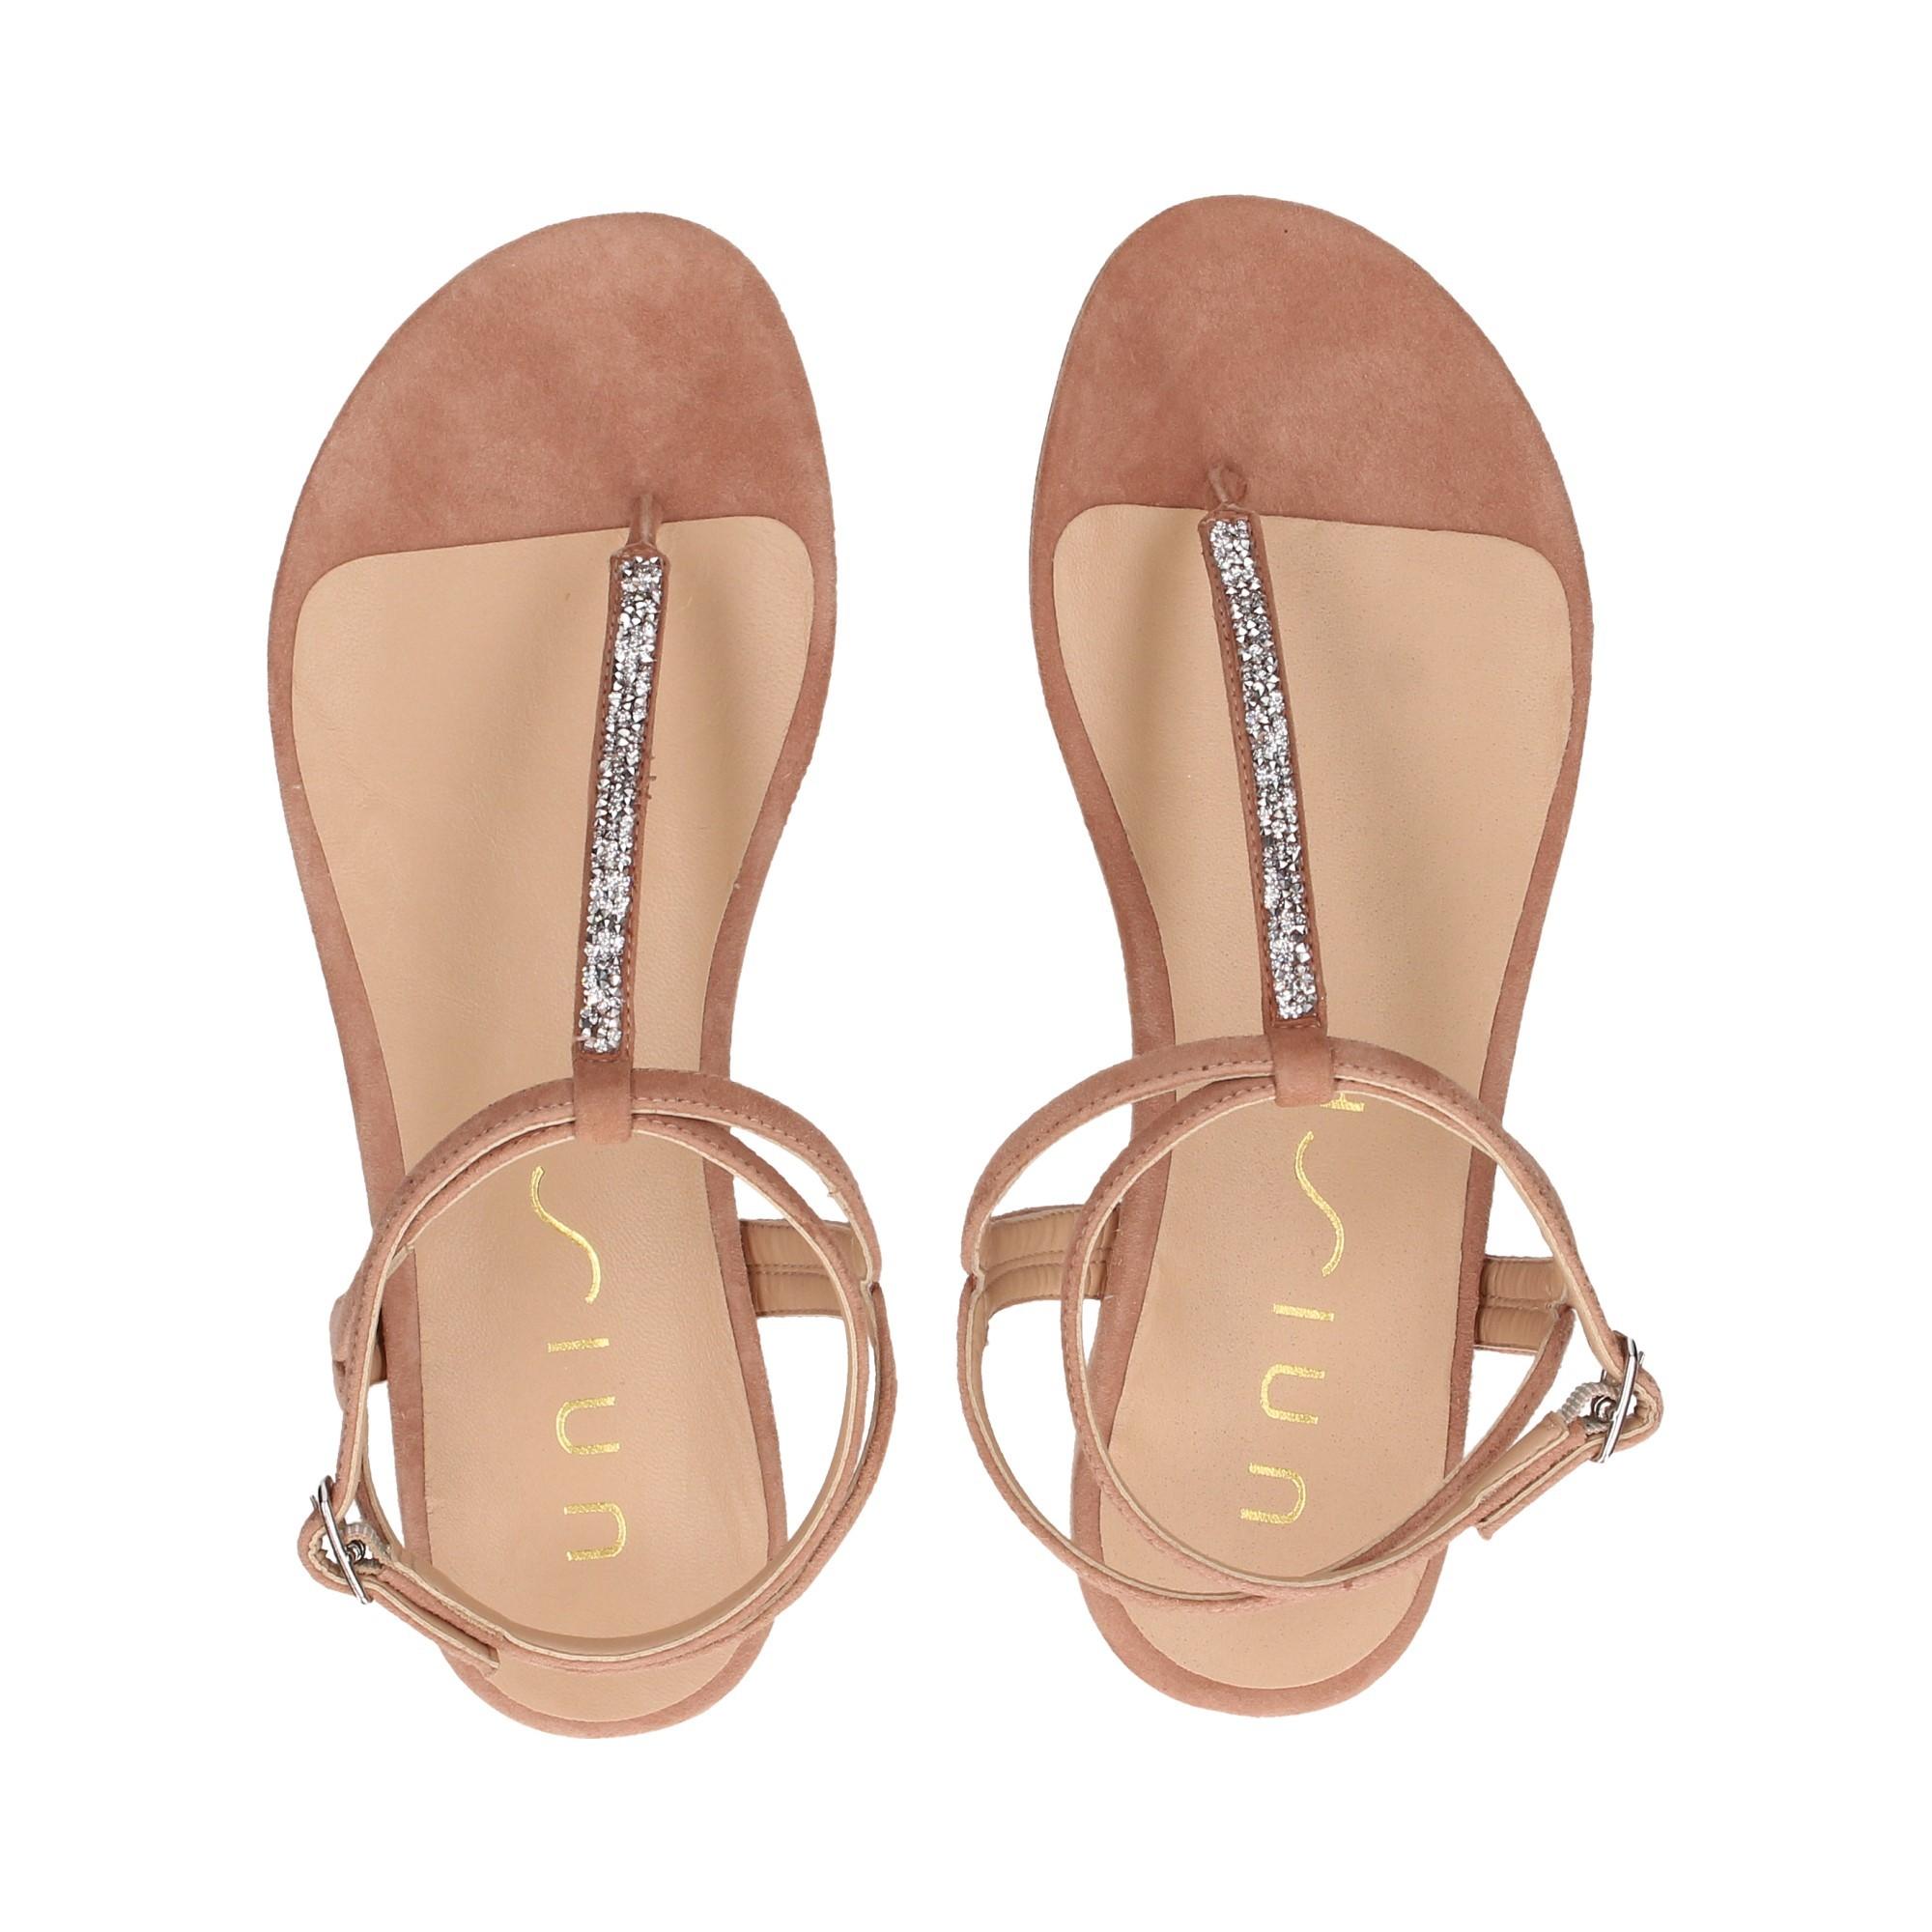 UNISA Flache Sandalen für Damen CHARLE_KS TUSCANY